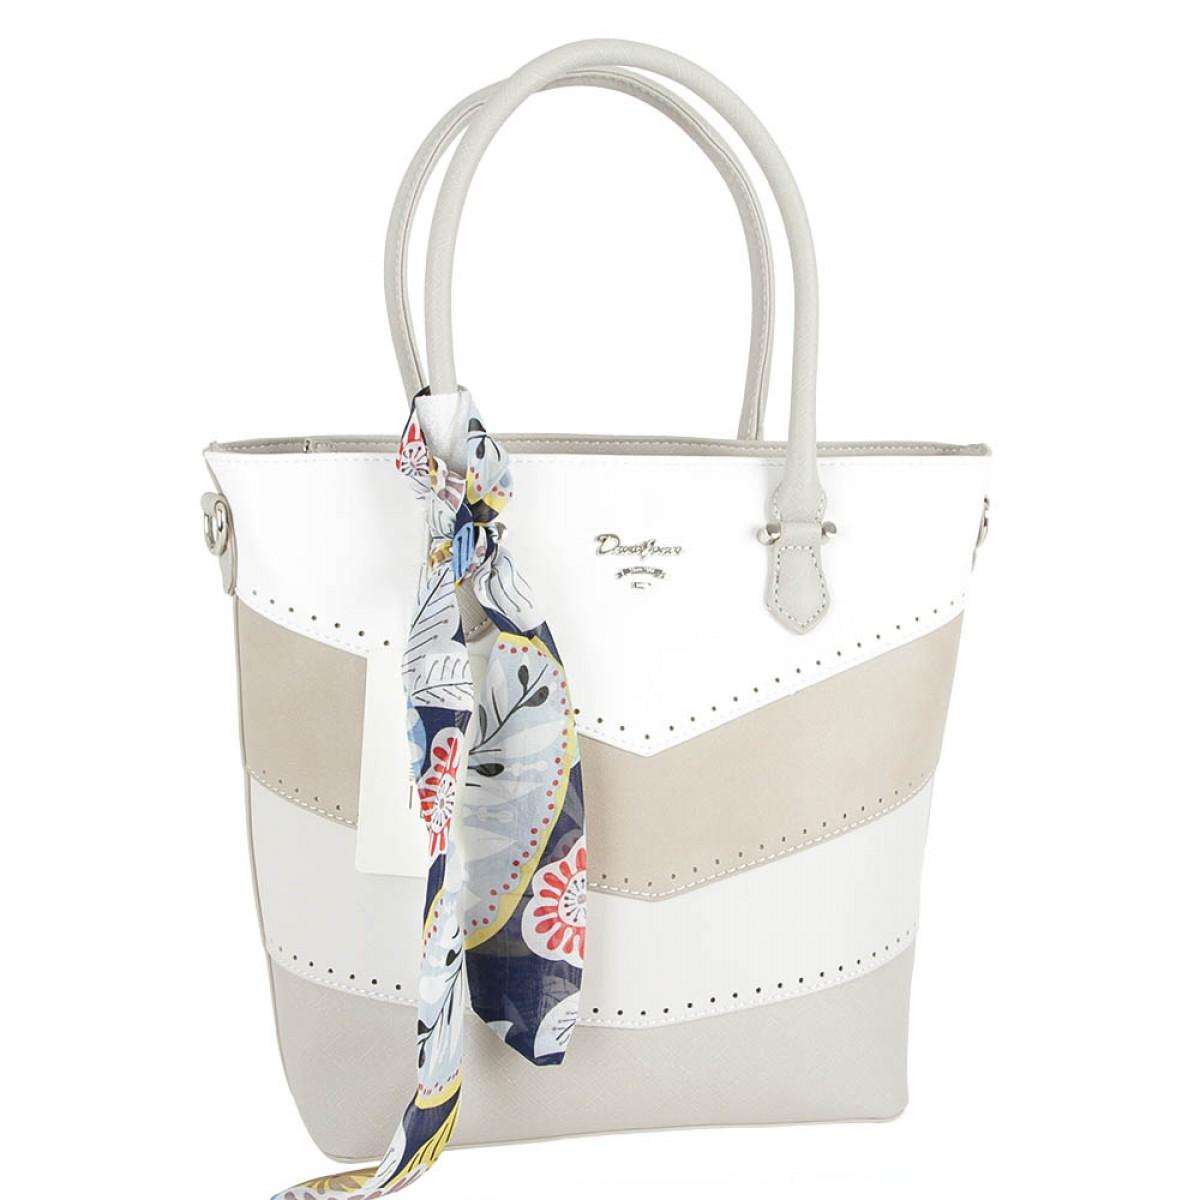 Жіноча сумка David Jones 5926-4 CREAMY GREY